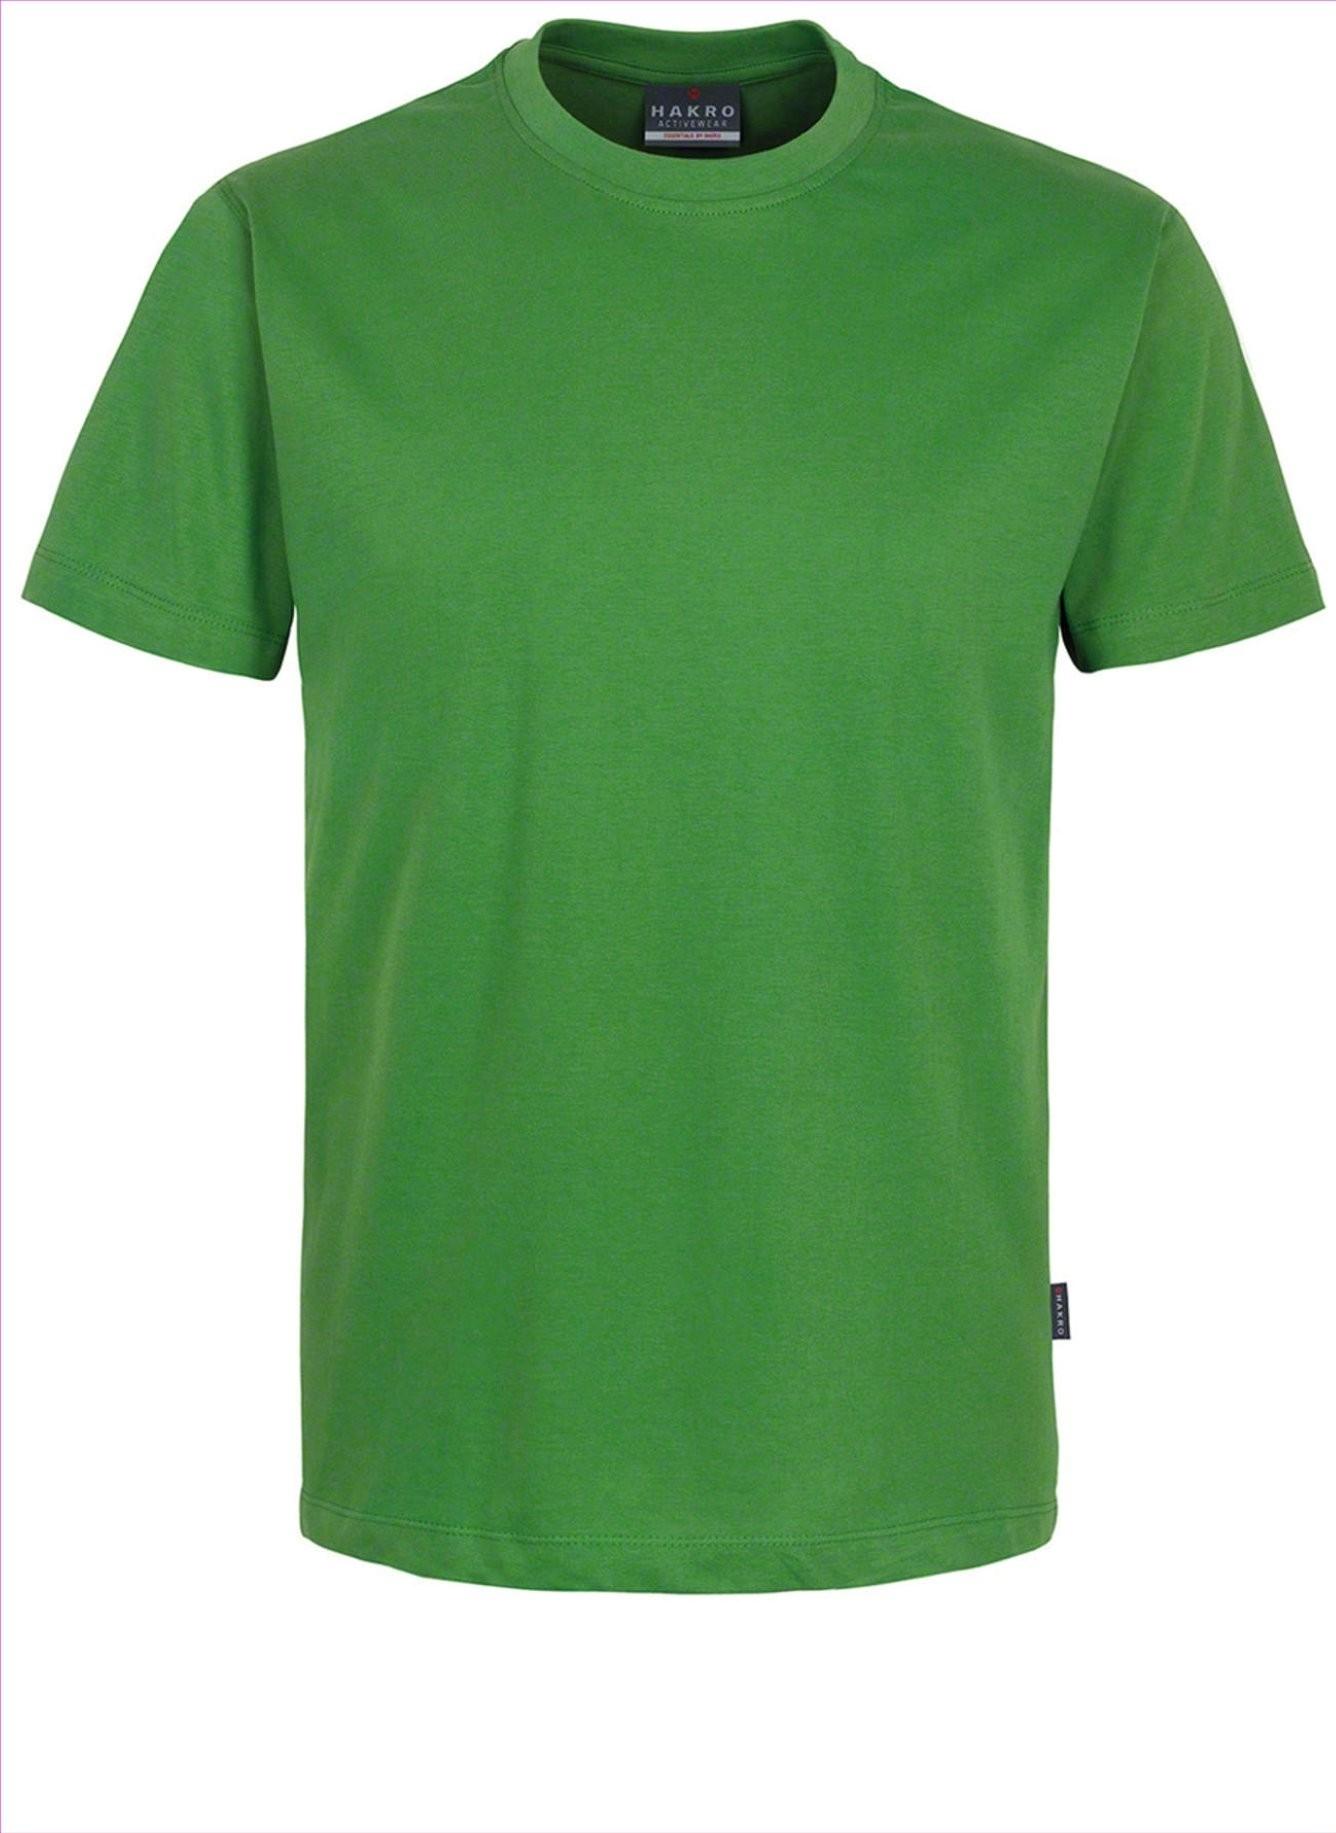 HAKRO T-Shirt Classic Herren